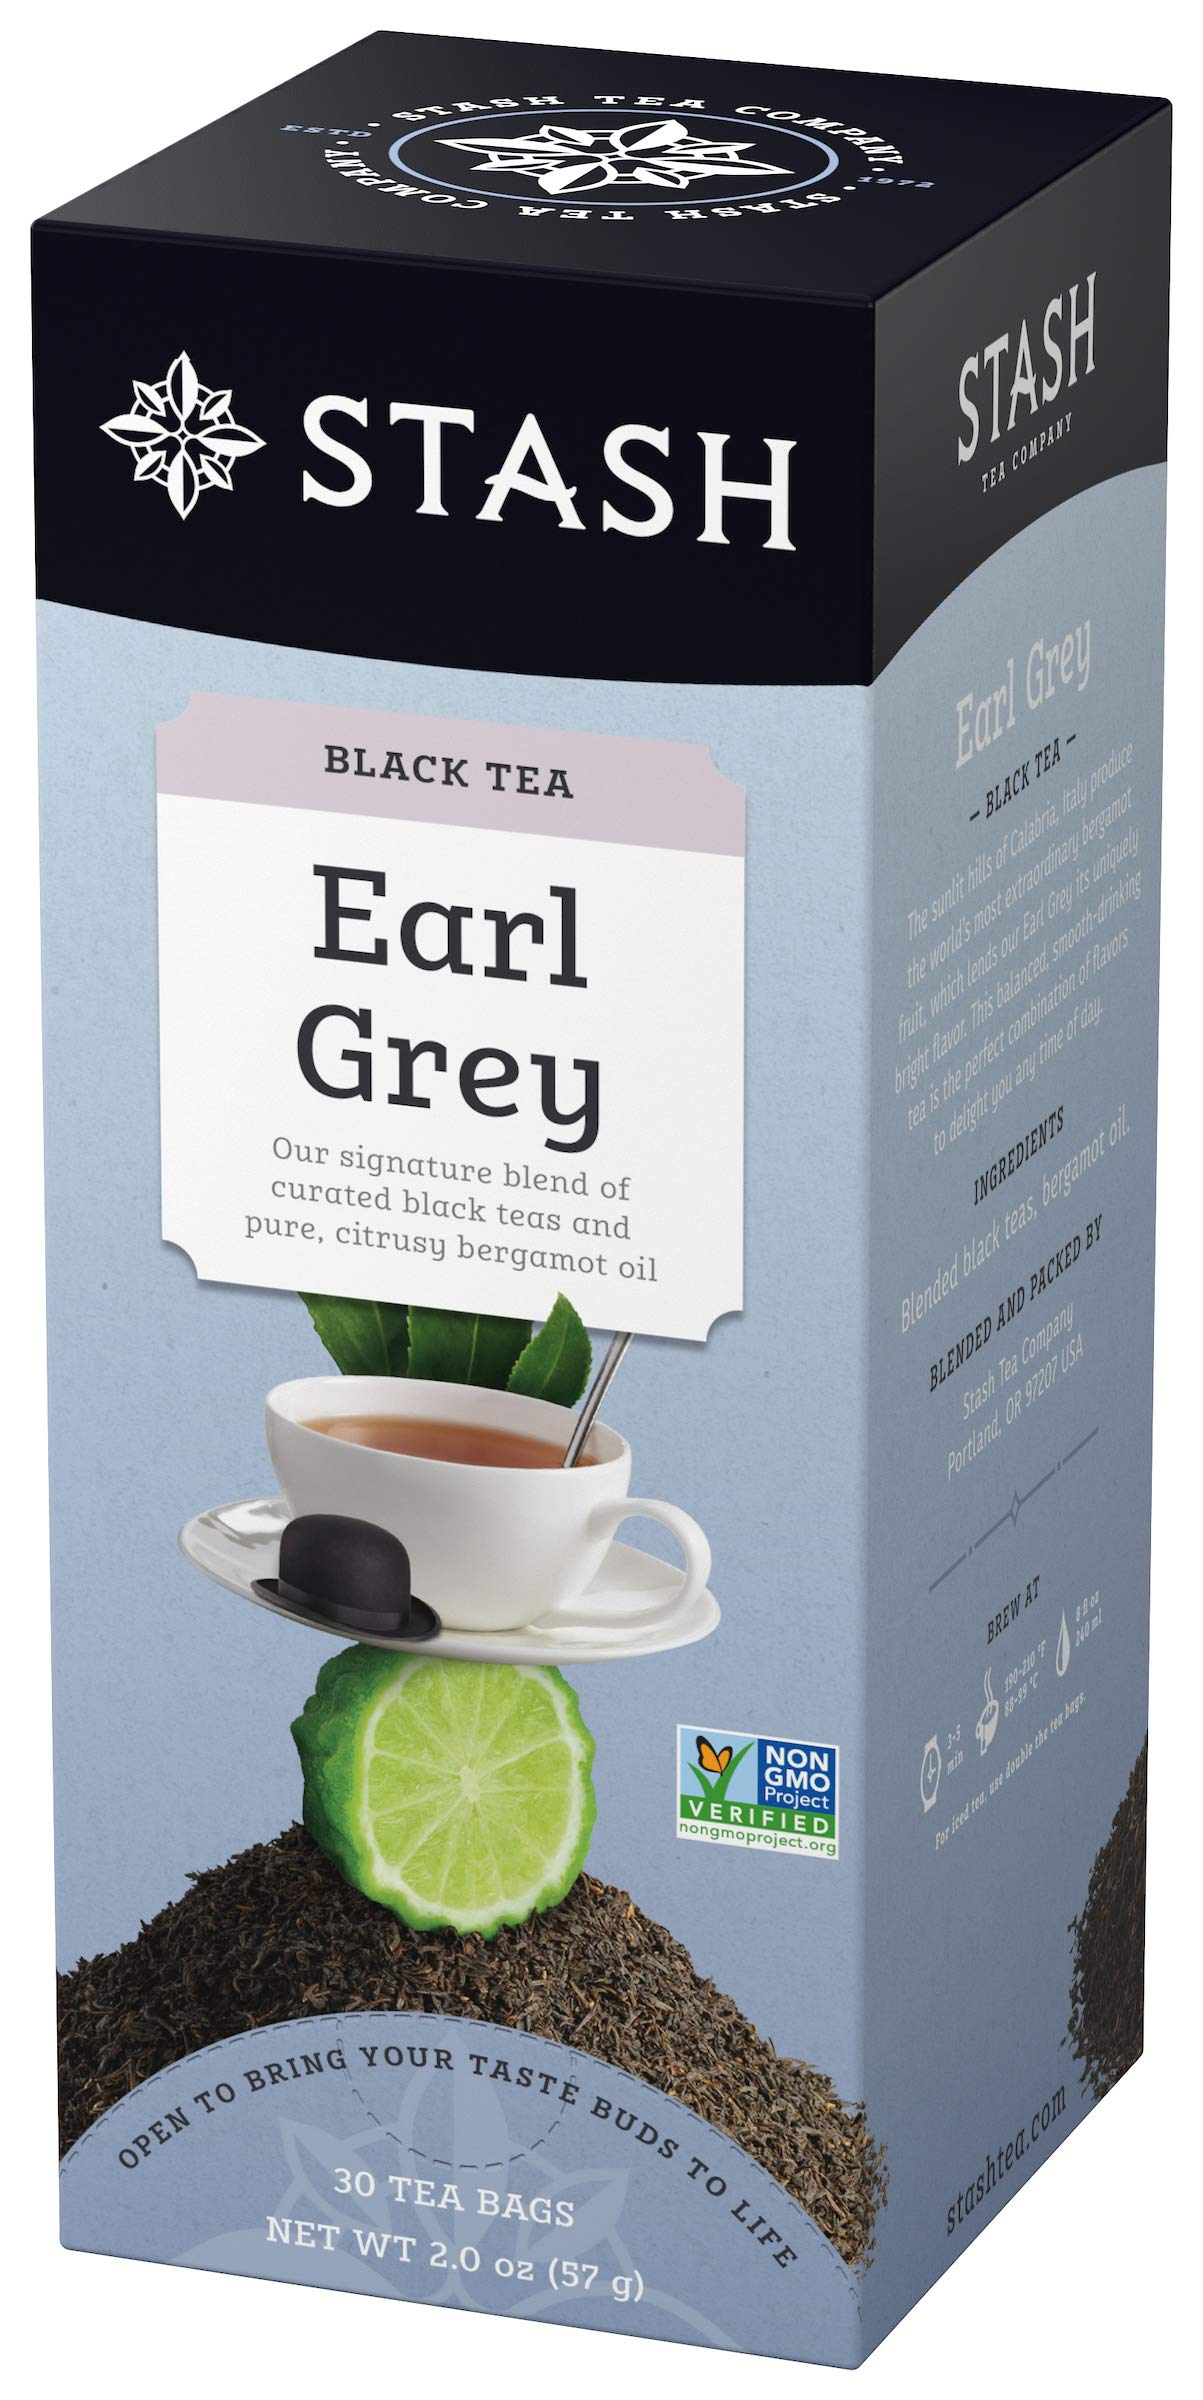 Stash Tea Earl Grey Black Tea, 30 Count Tea Bags in Foil (Pack of 6) Full Caffeine Tea, Black Tea with Bergamot, Enjoy Hot or Iced